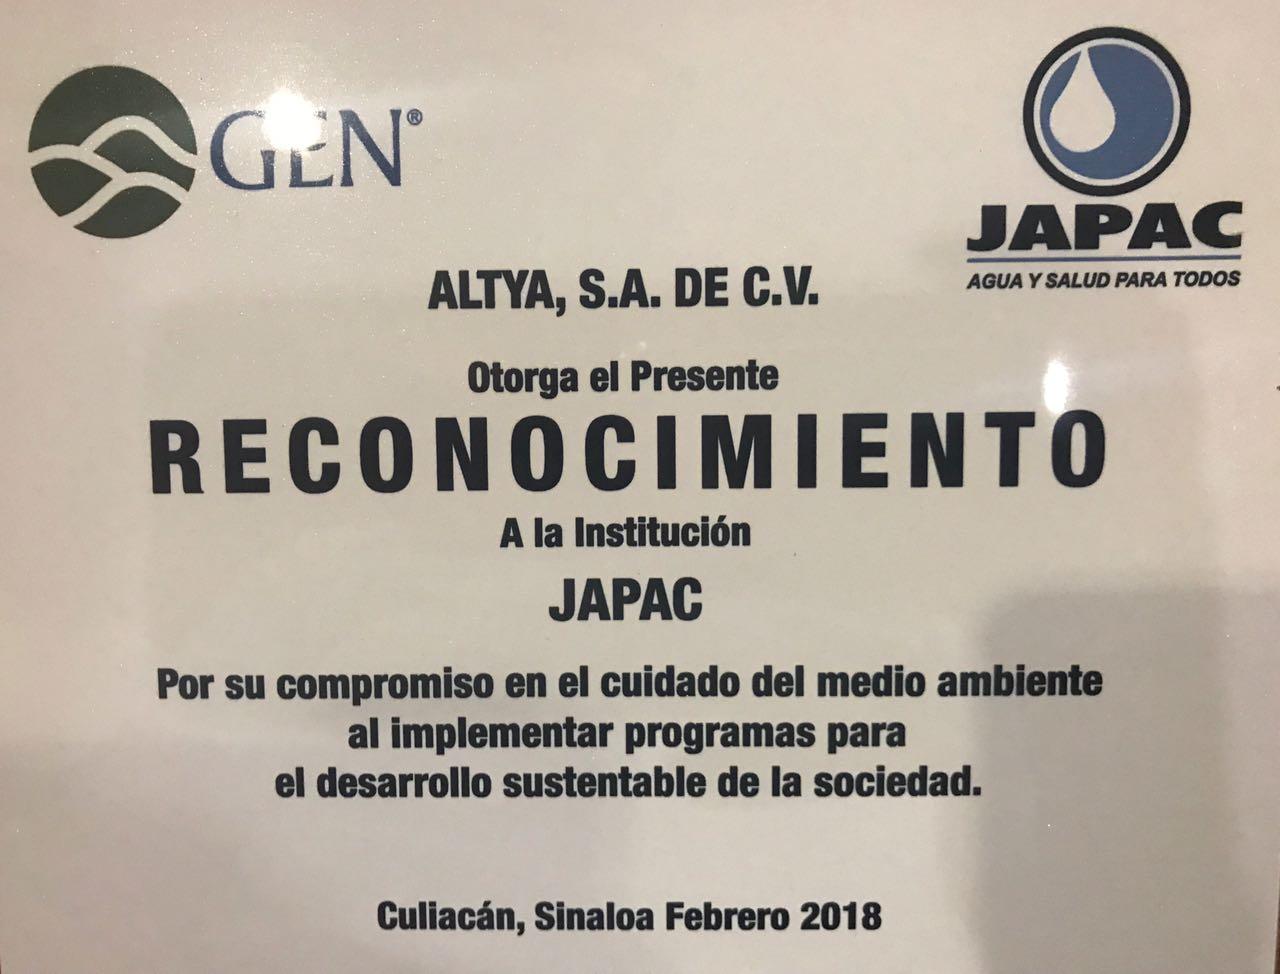 JAPAC-recibe-japac-reconocimiento-honrar-honra-02